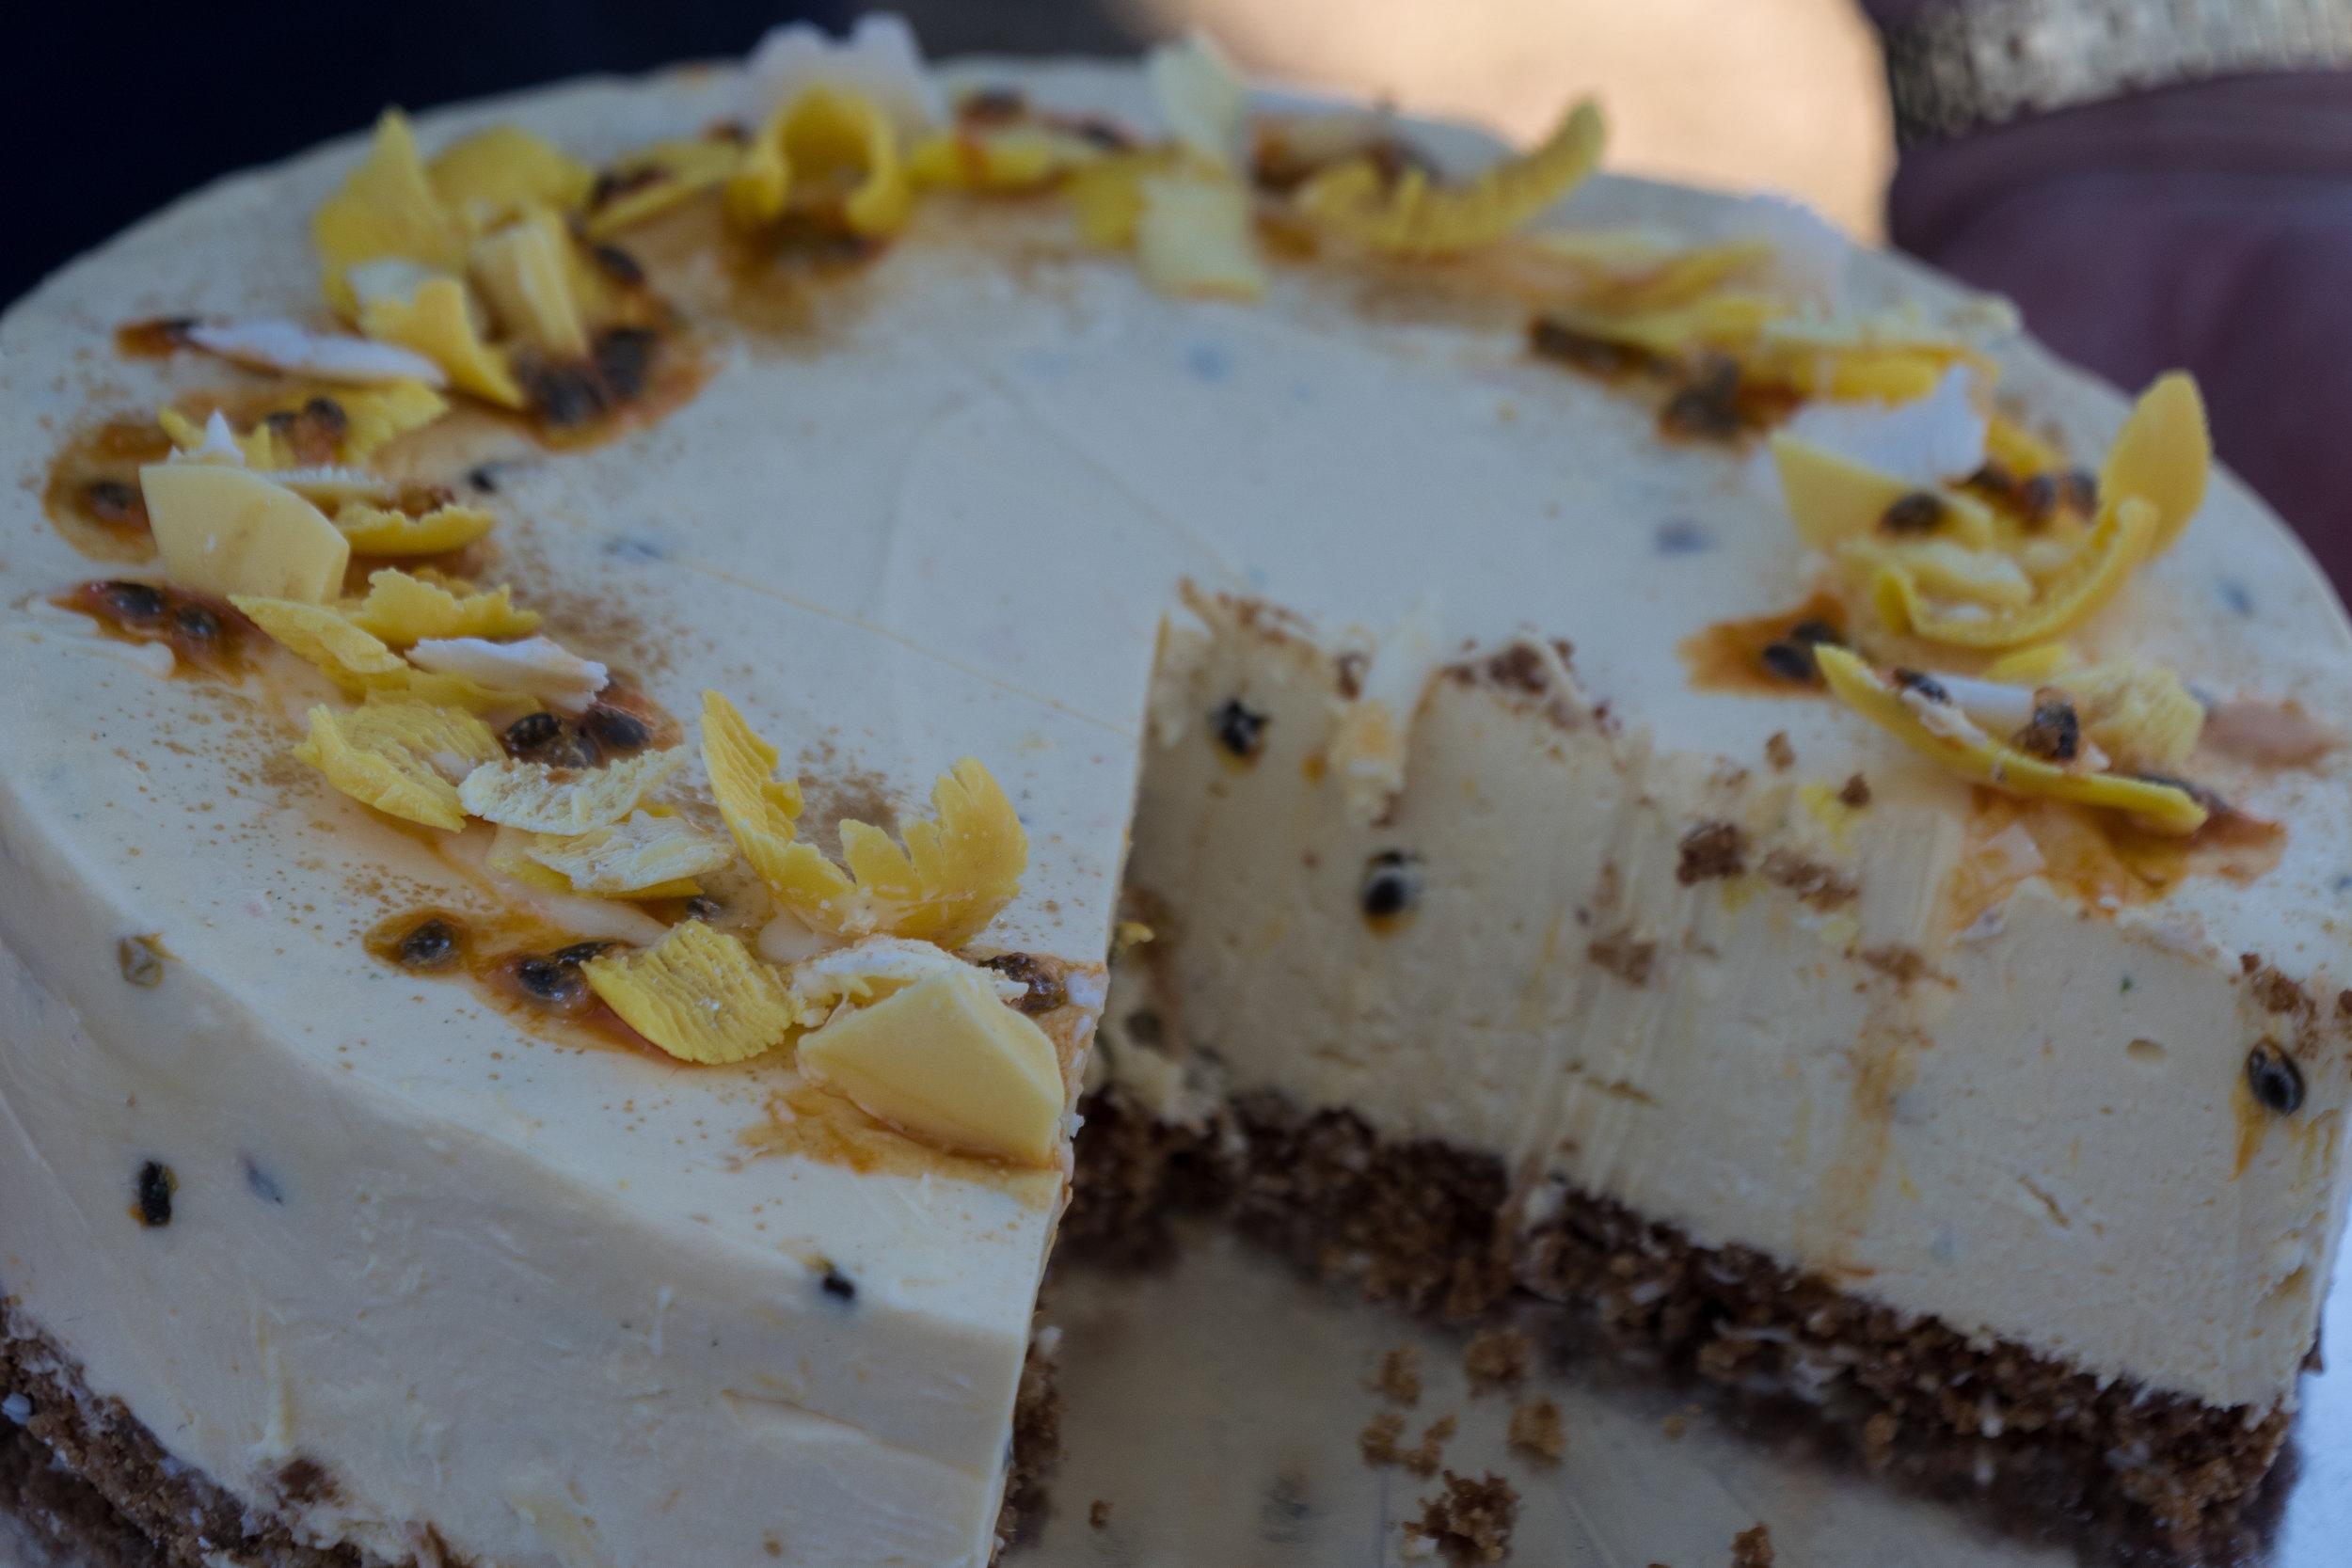 Cheesecake Competition — Nosh Narrabri